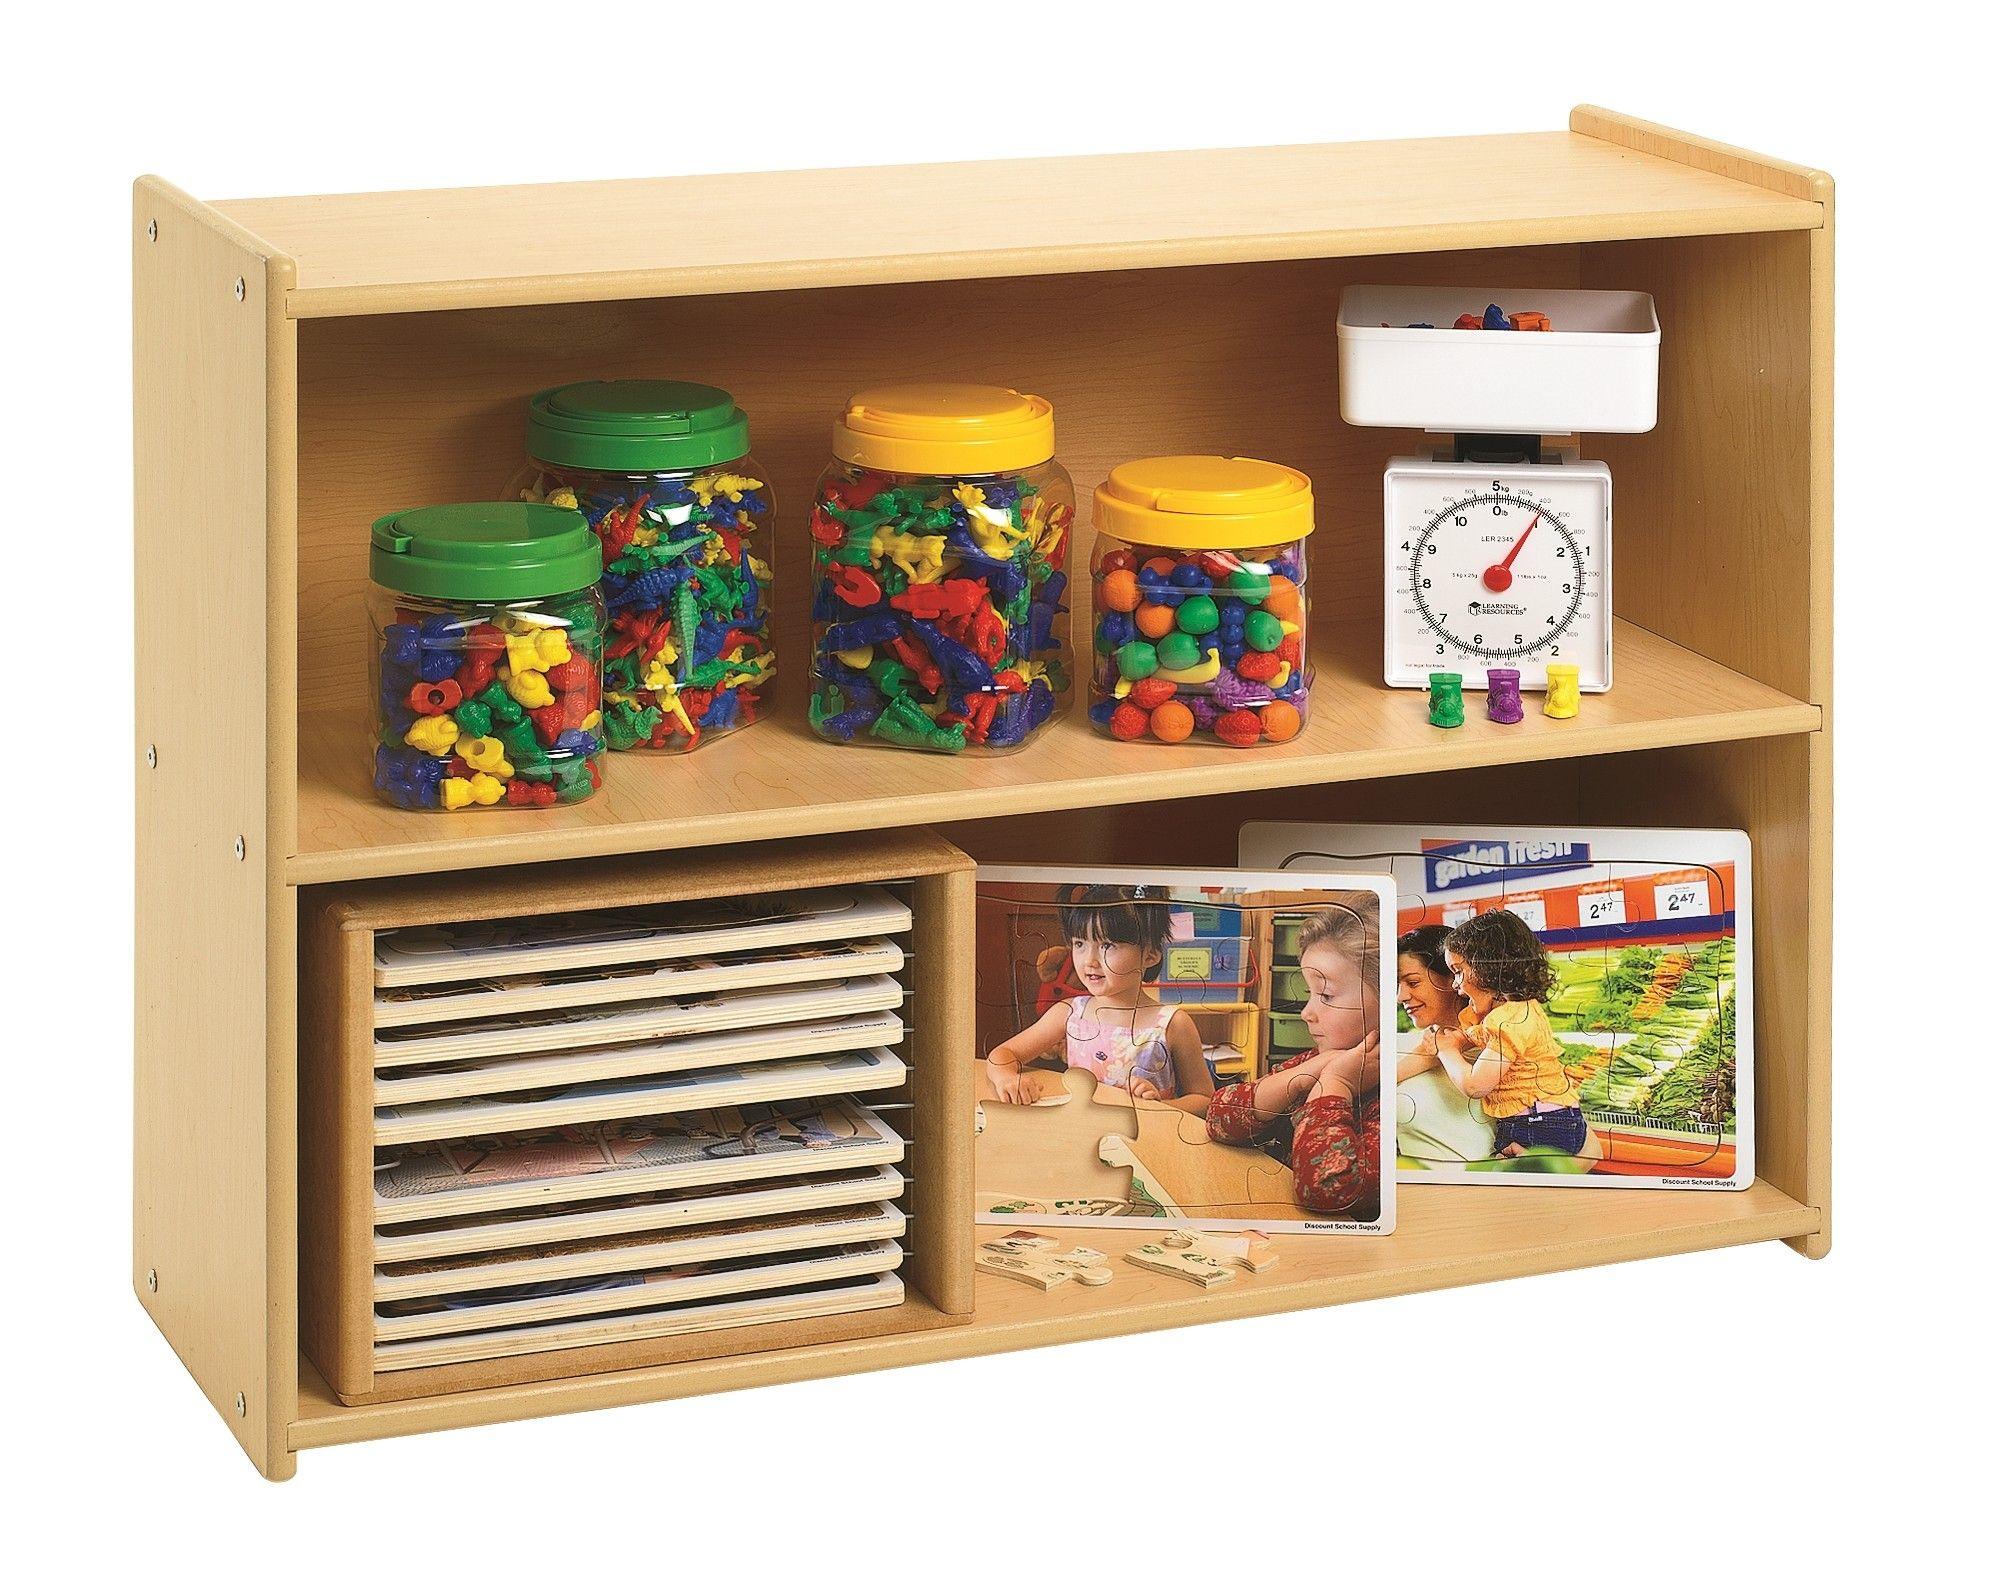 Value Line 3 Compartments Shelving Unit Wooden Storage Storage Shelves Storage Cabinet Shelves